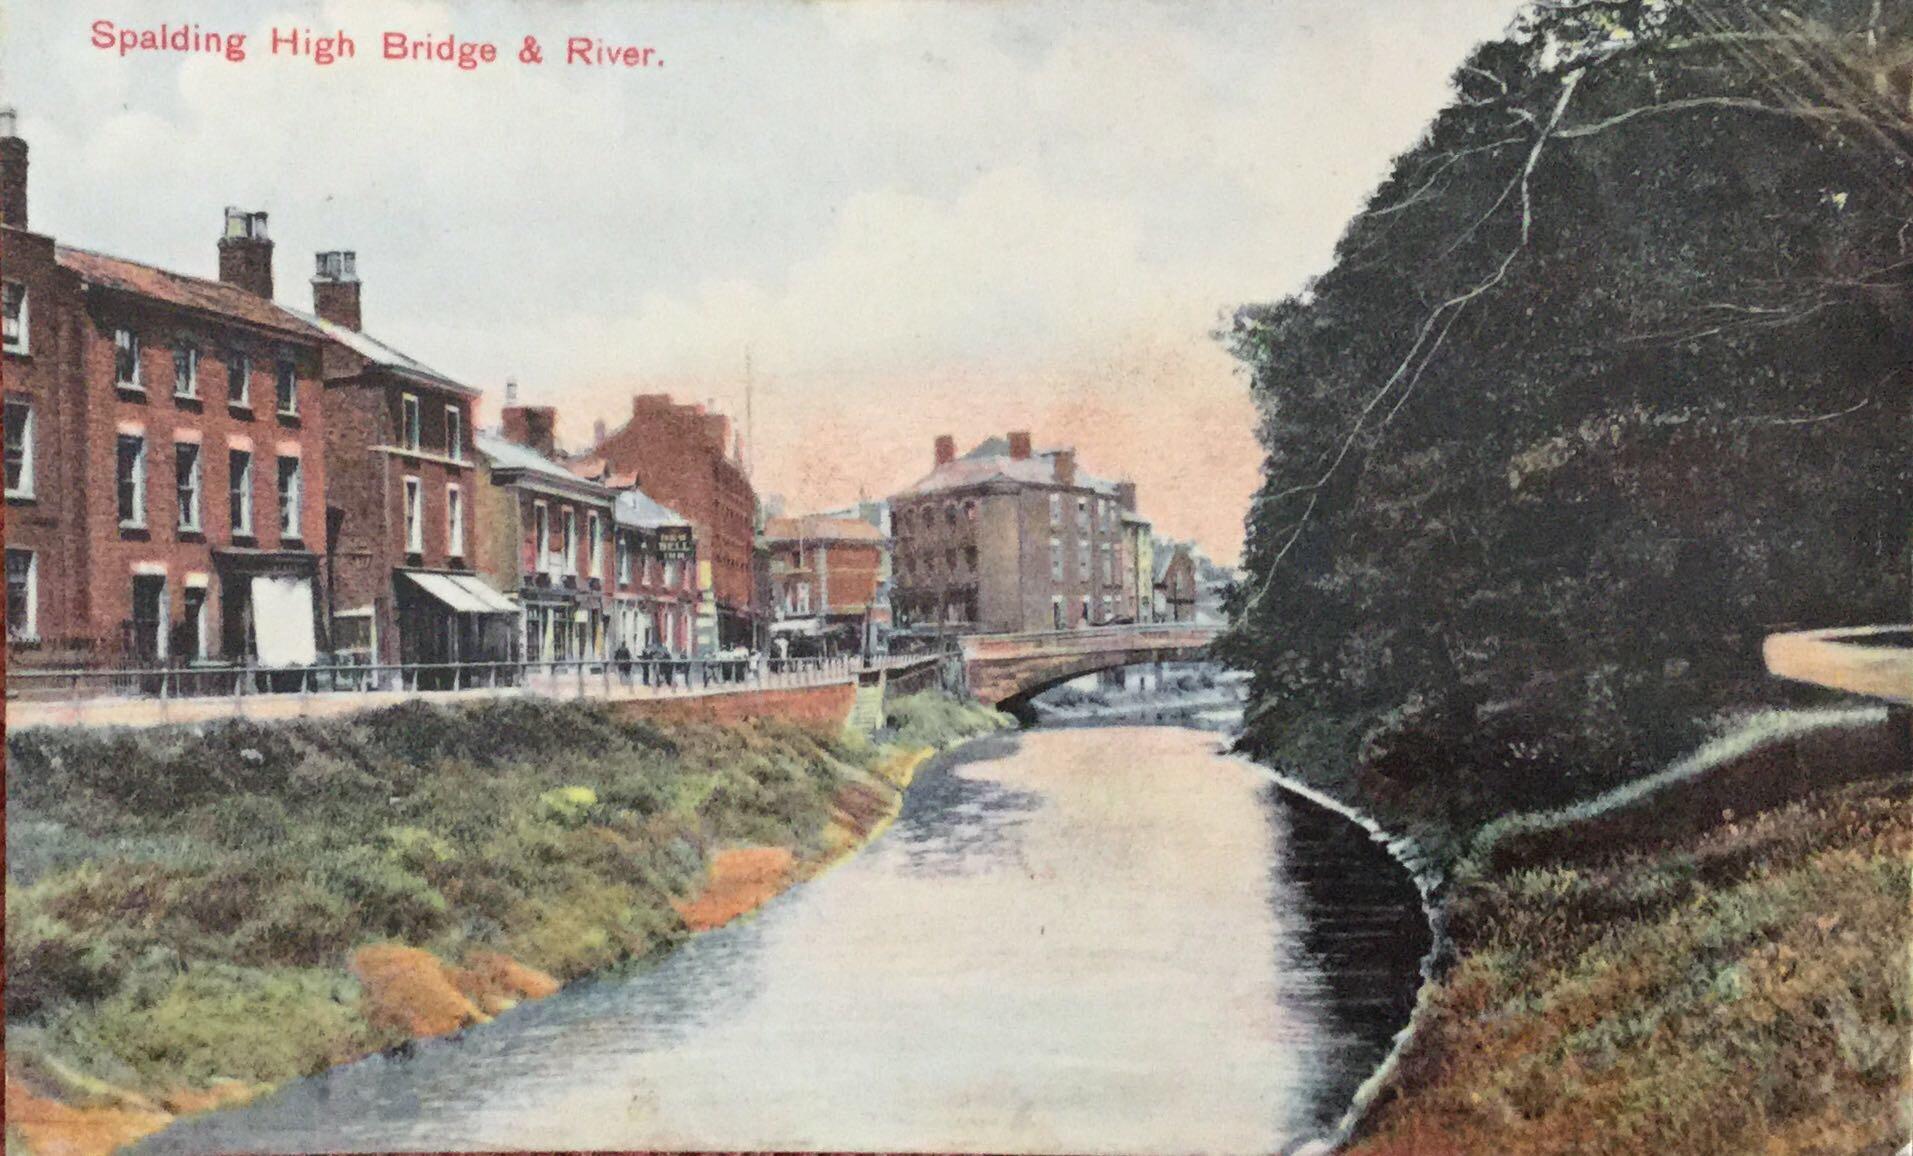 River Welland & High Bridge – Past and Present